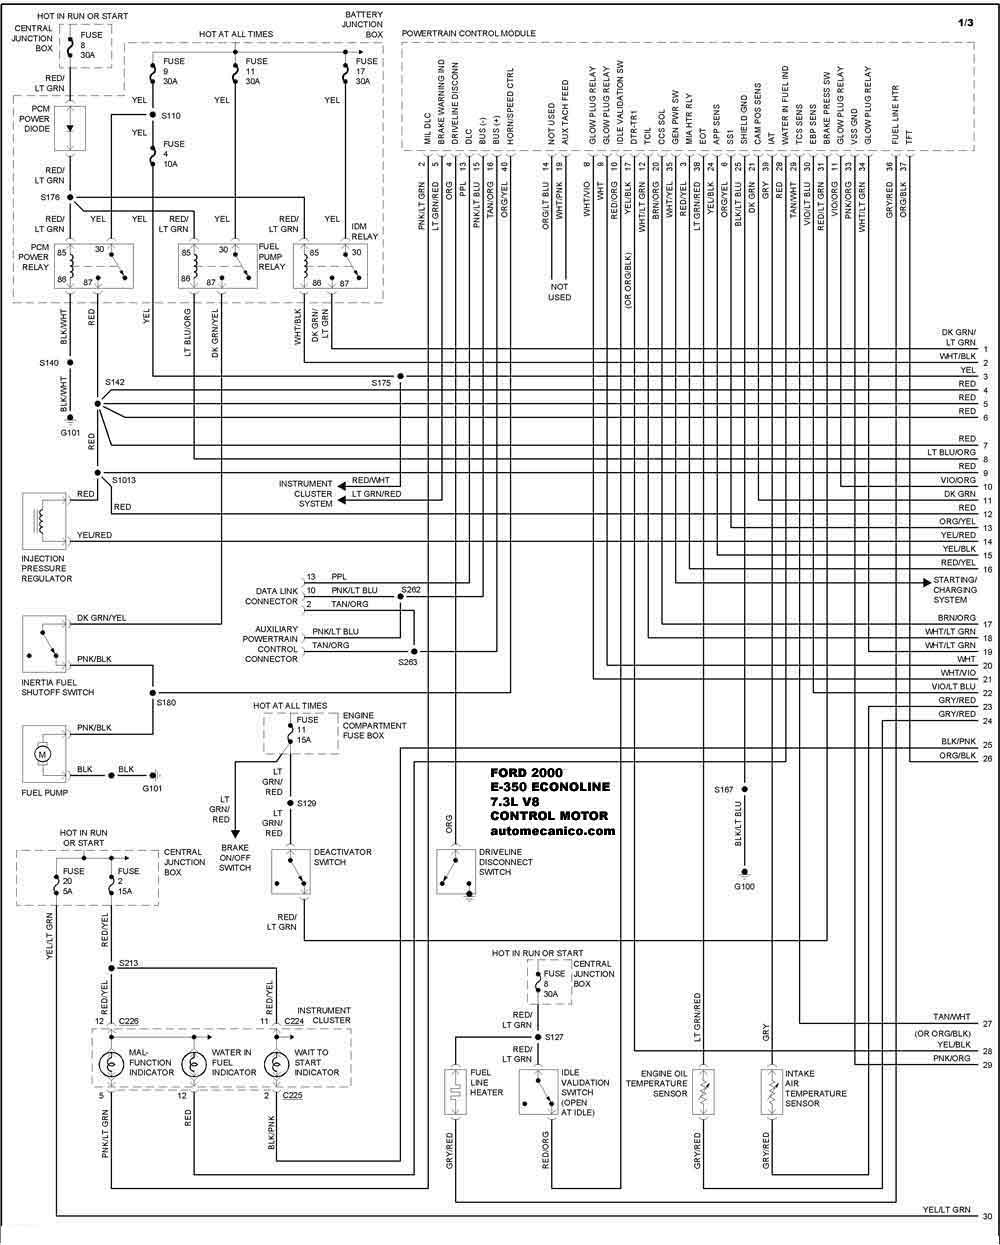 2000 ford 7 3 Diagrama del motor